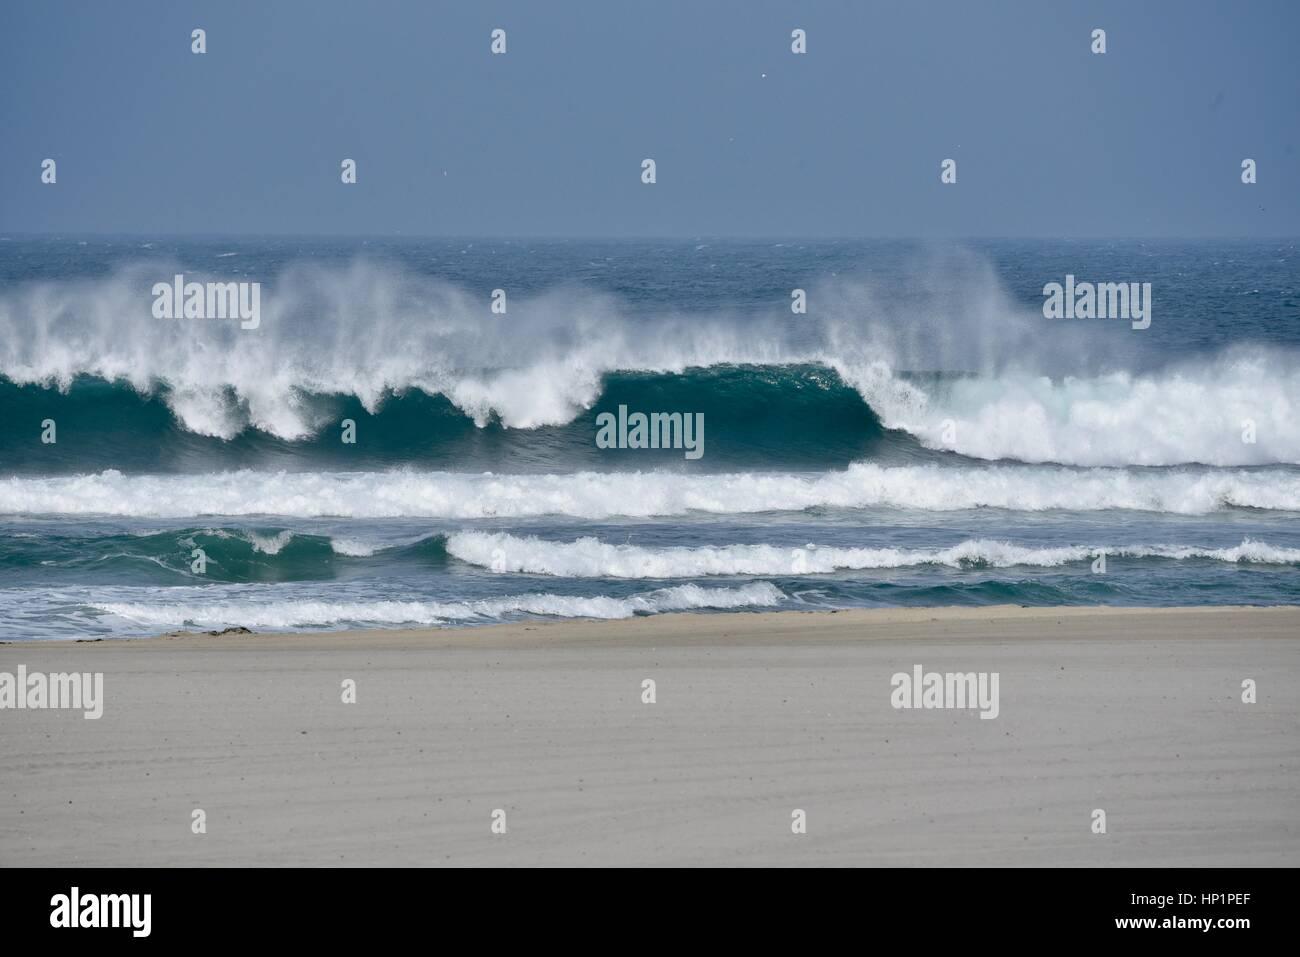 San Diego, California, USA, 17th February, 2017. Crashing surf at Mission Beach in San Diego, California, USA. National Stock Photo